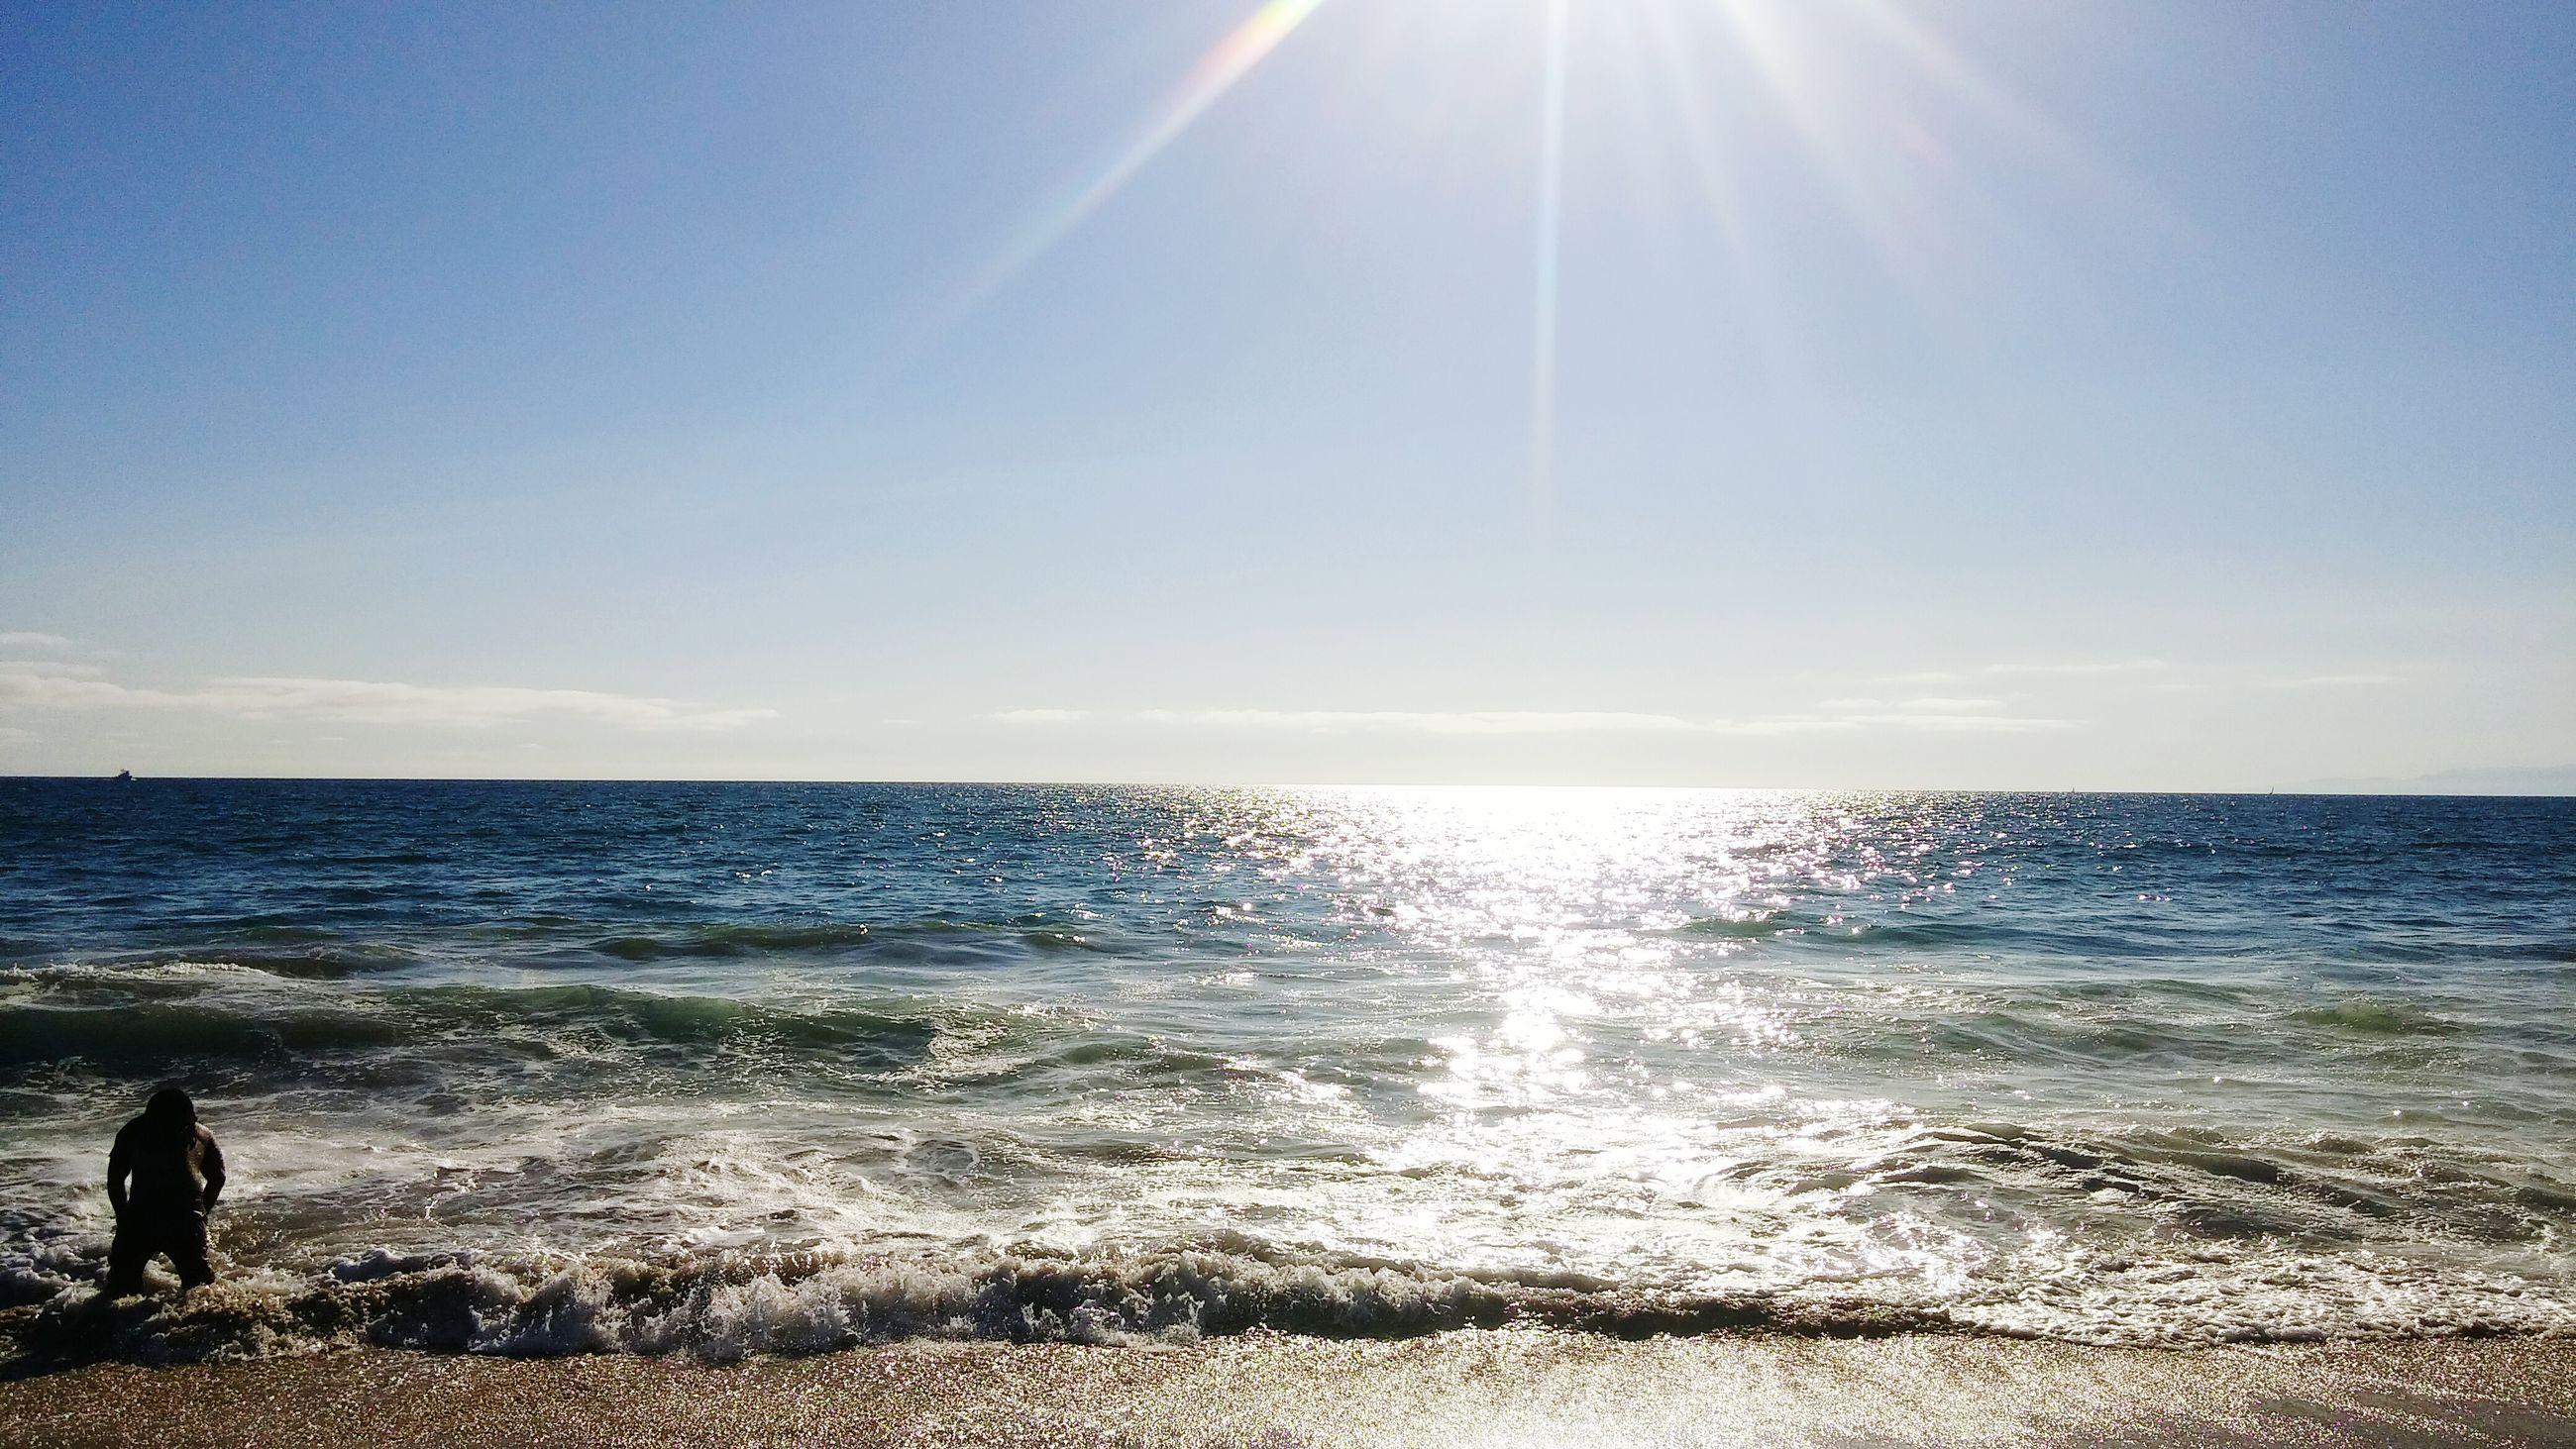 sea, sun, horizon over water, water, sunbeam, sunlight, beach, scenics, lens flare, tranquil scene, beauty in nature, tranquility, sky, shore, nature, sunny, idyllic, blue, bright, silhouette